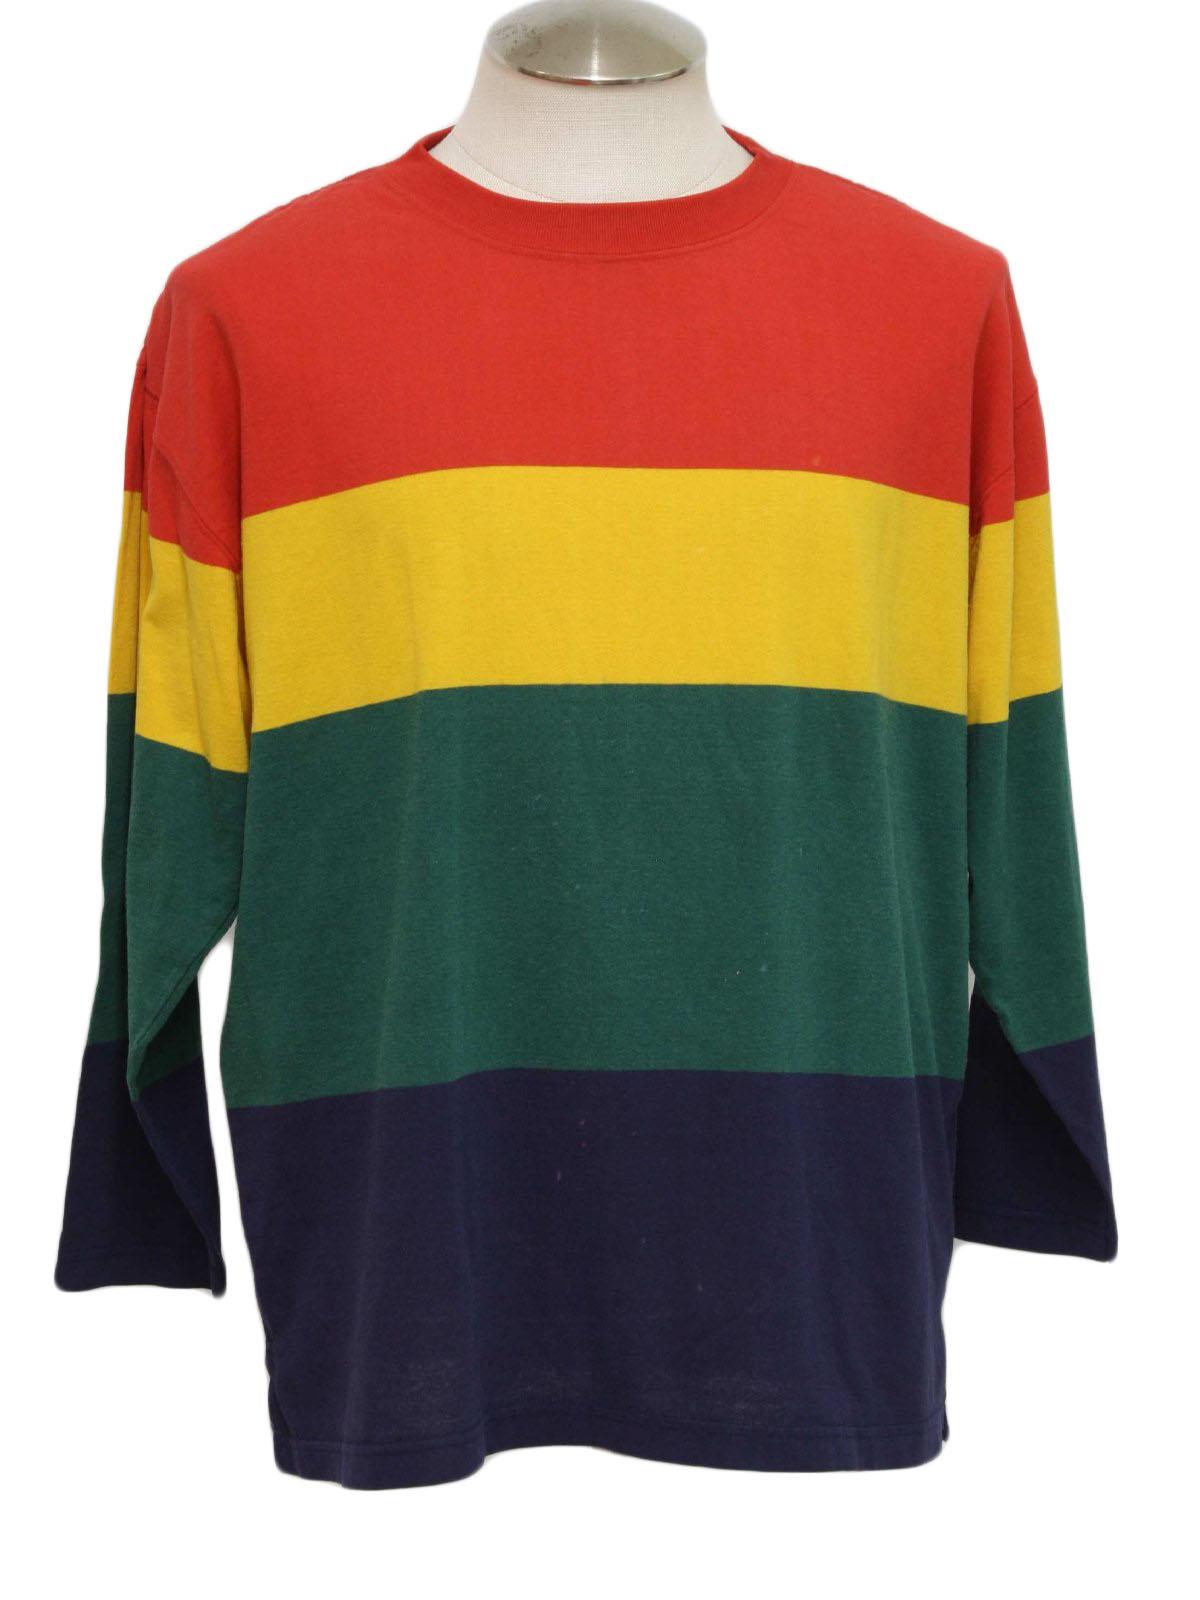 Retro Nineties T Shirt 90s Huntington Mens Red Yellow